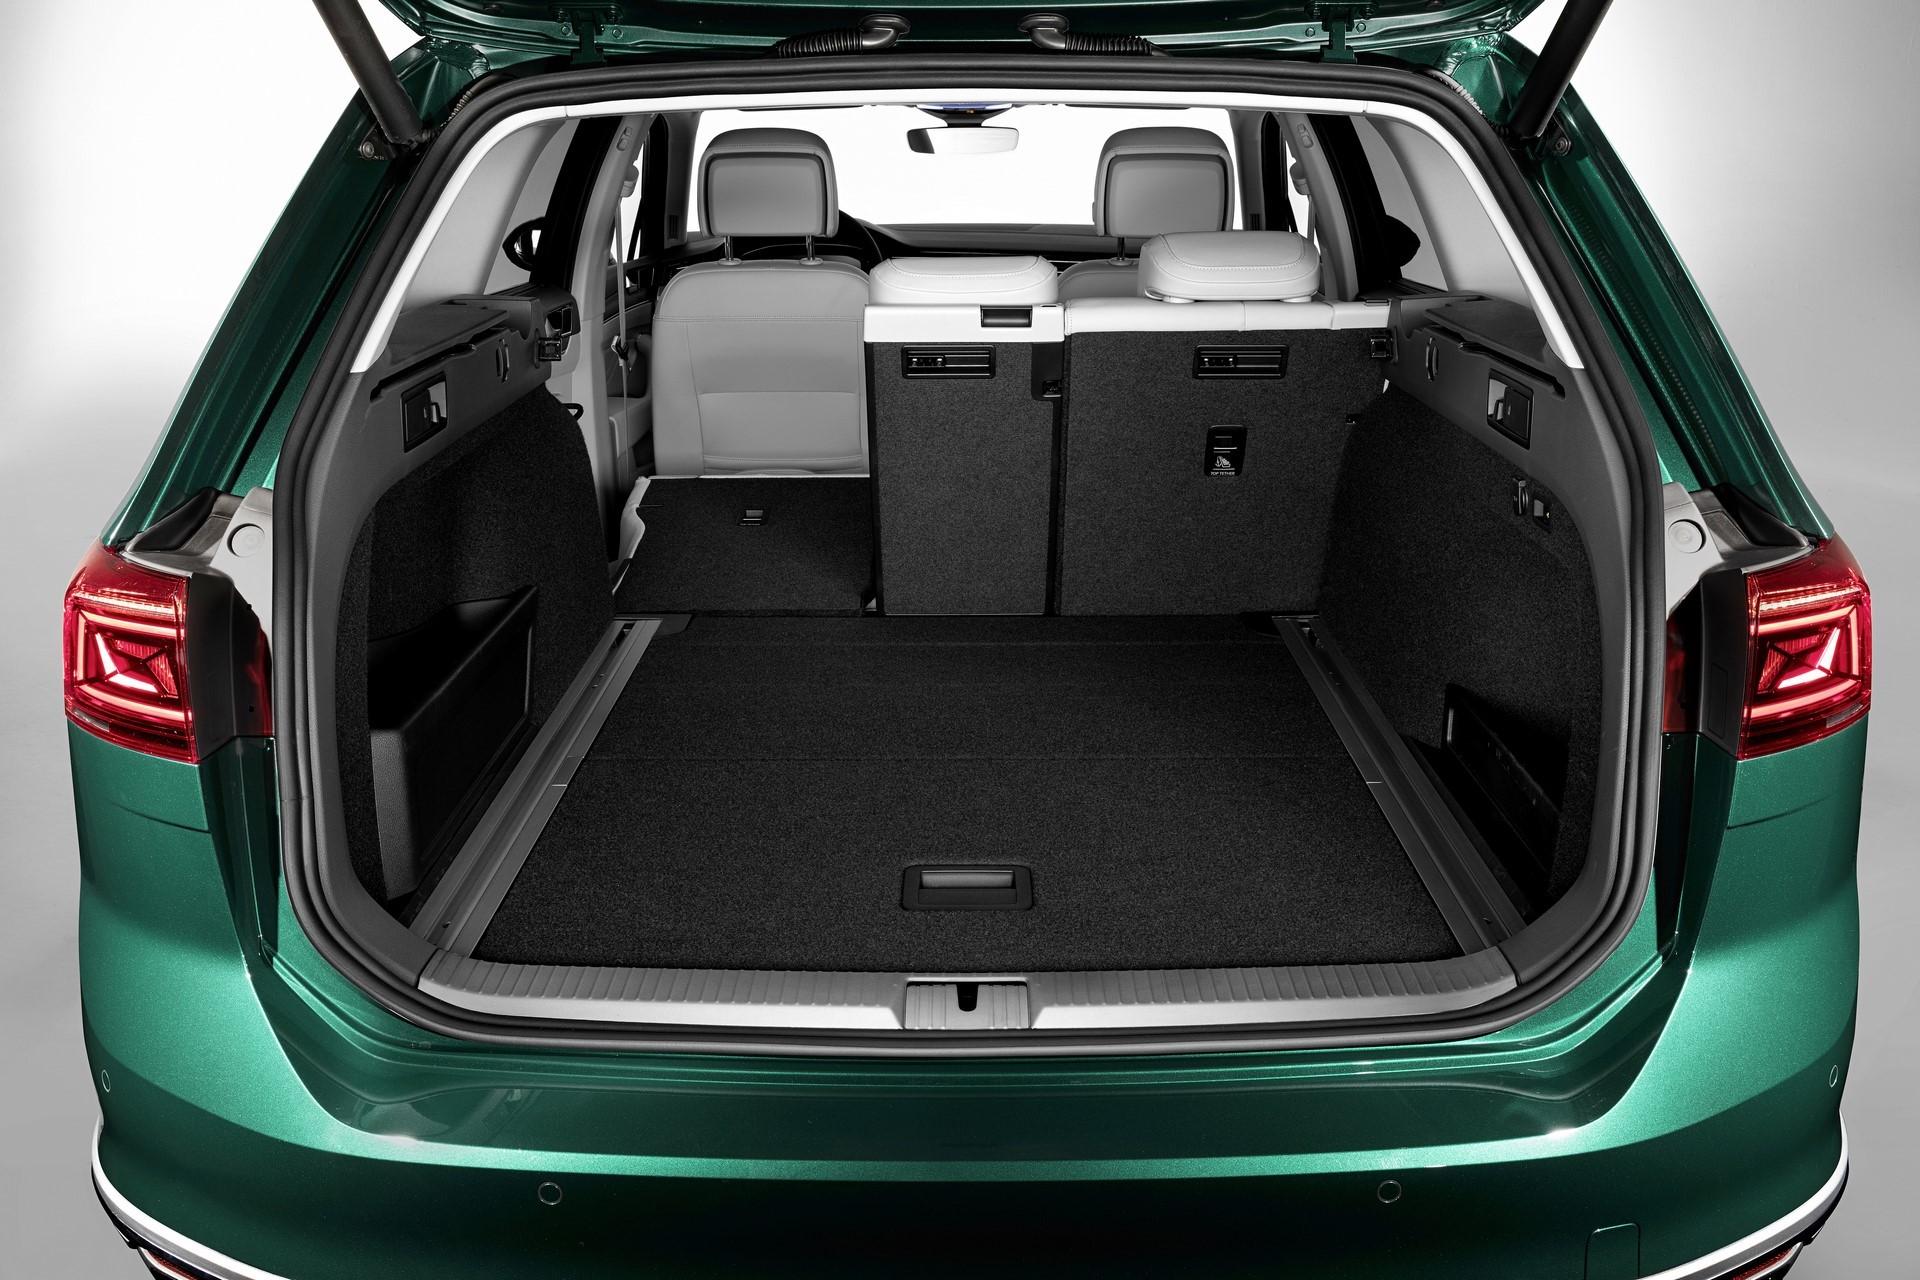 The new Volkswagen Passat Alltrack